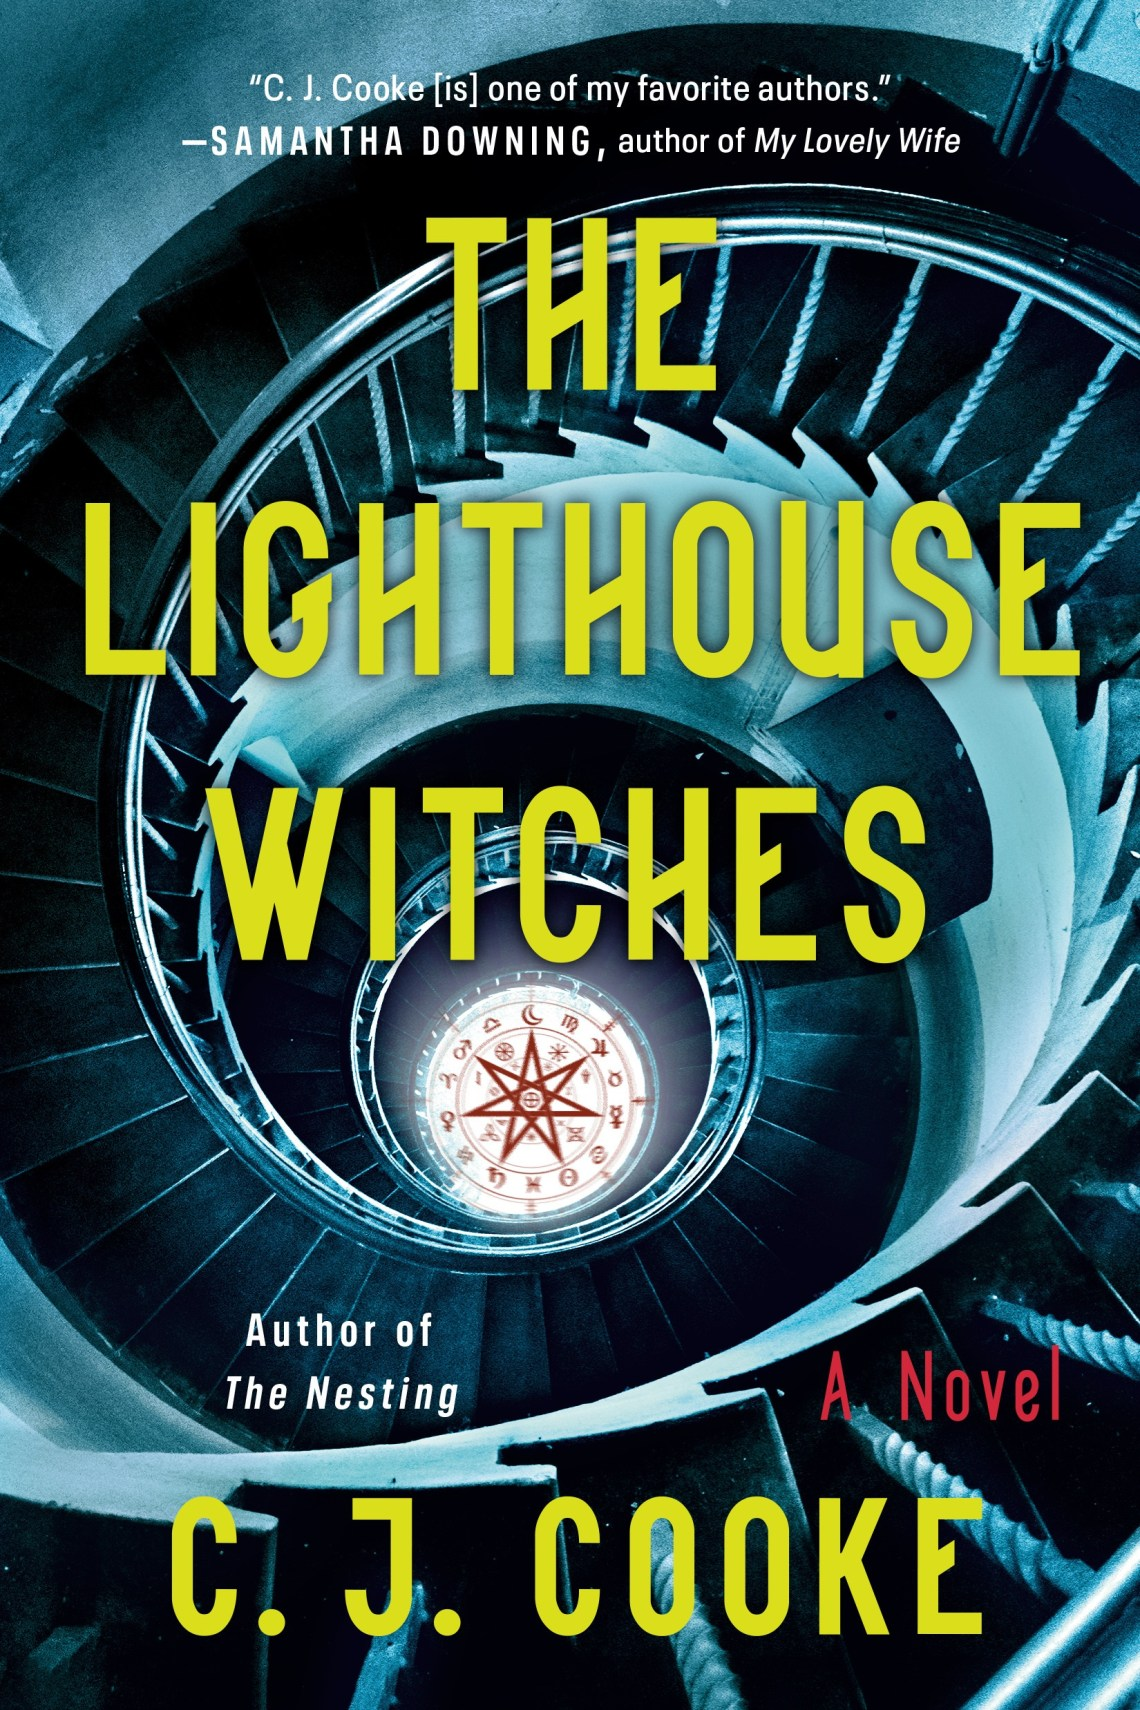 perfect book for spooky season